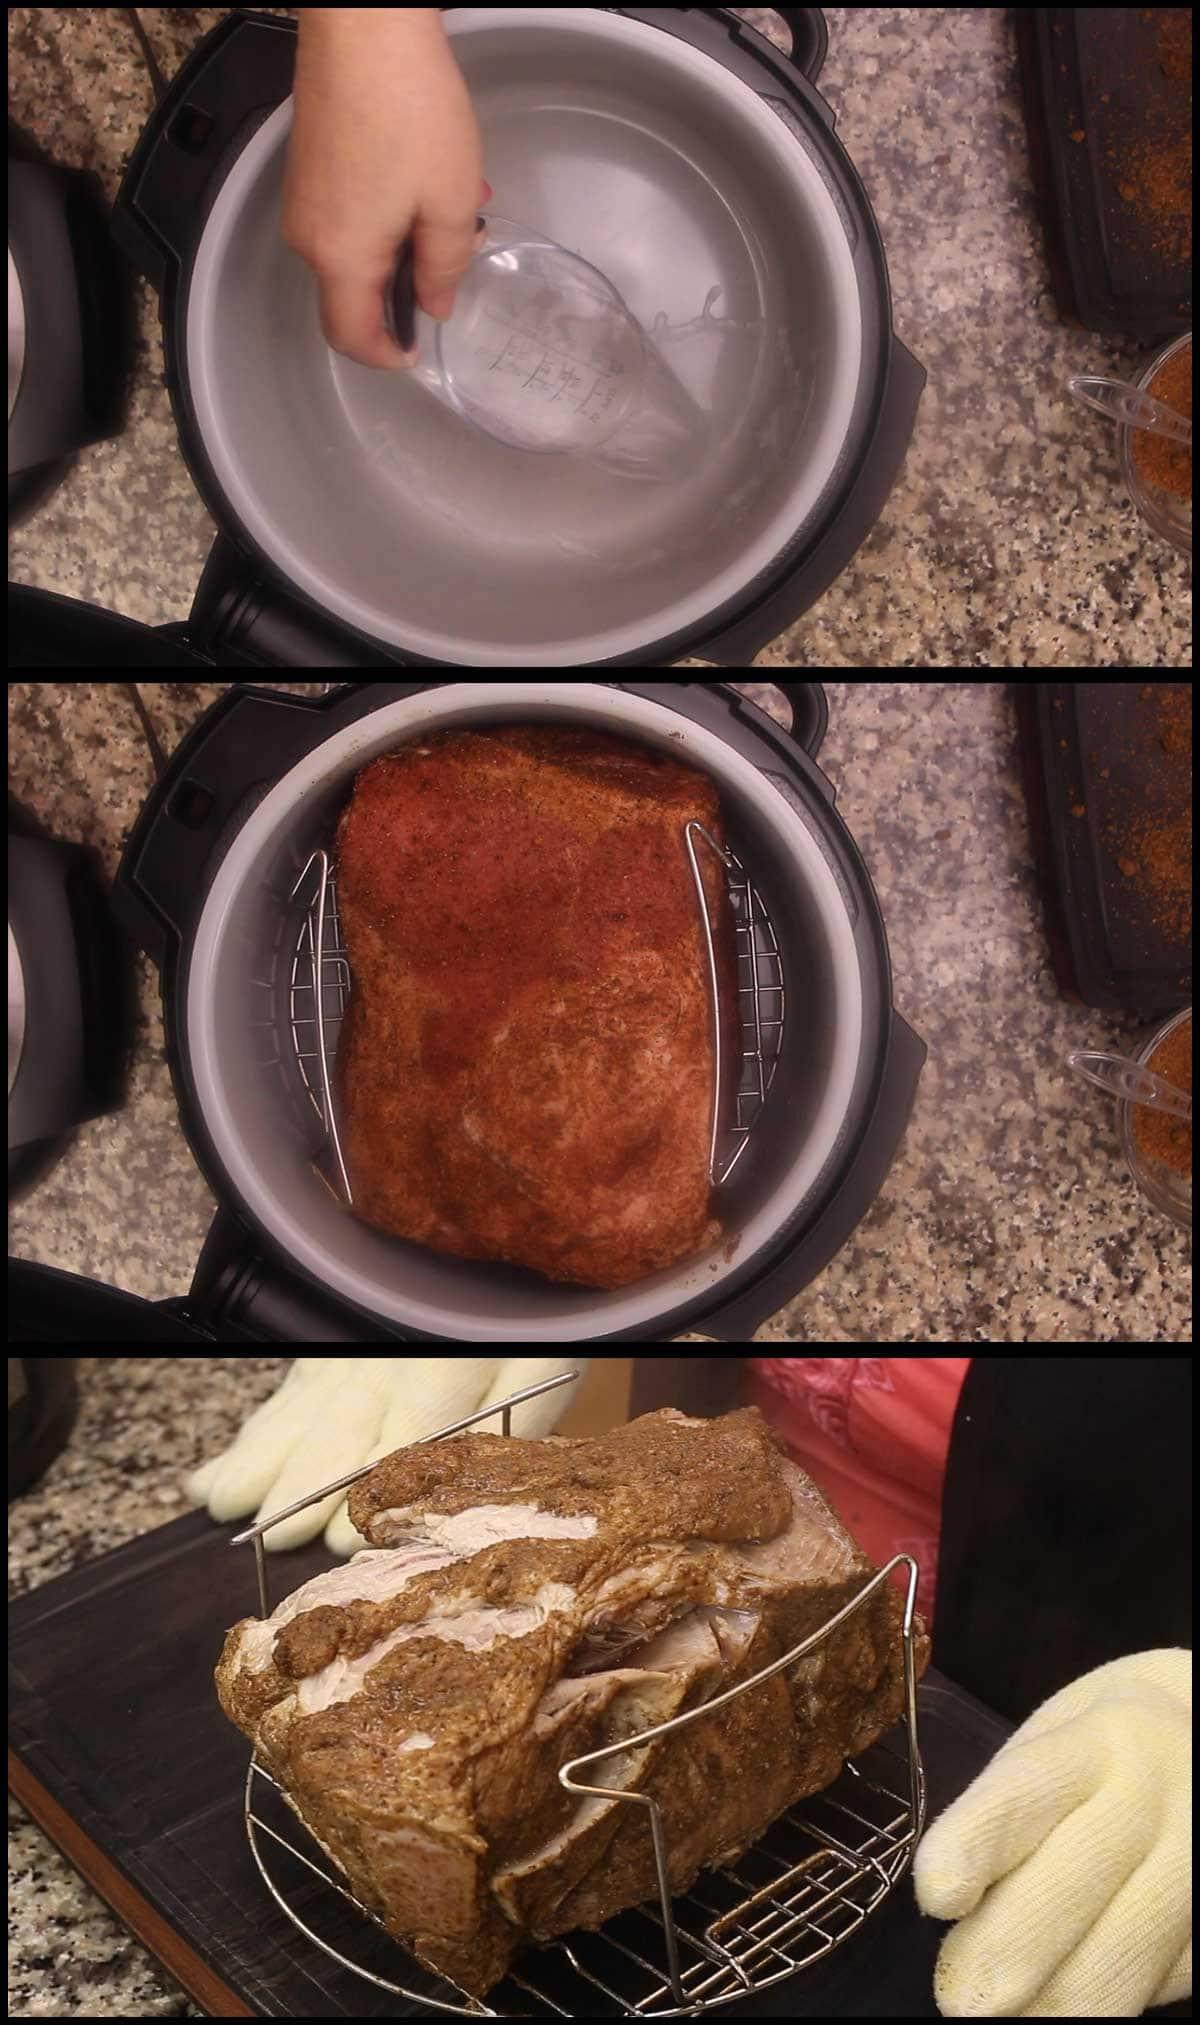 pressure cooked pork butt